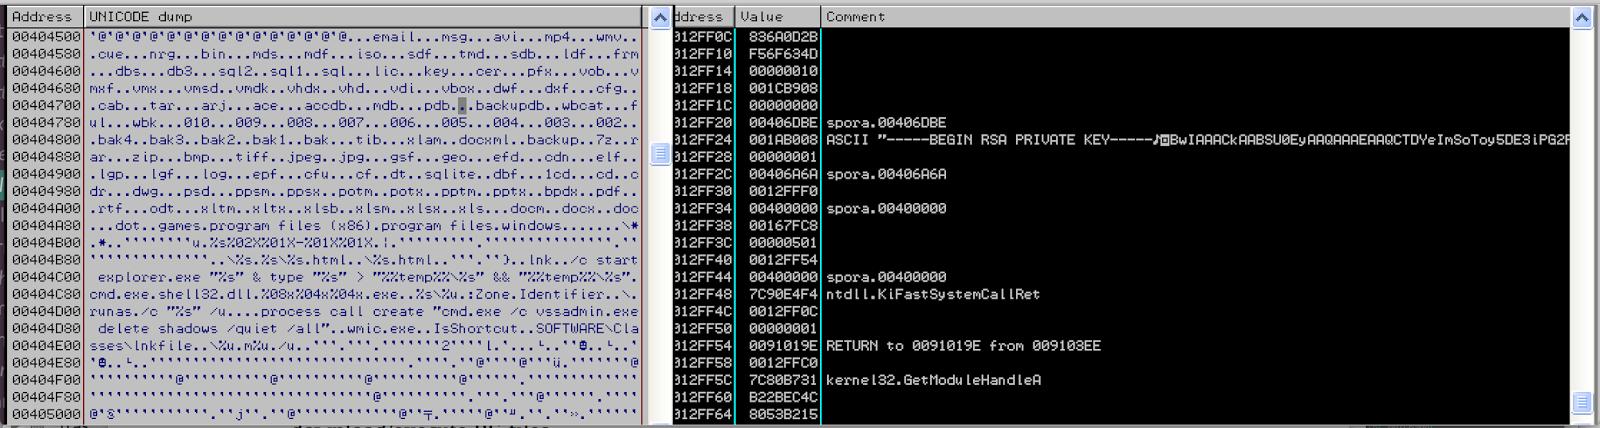 06-01-2017 Spora Ransomware Configuration – Reverse